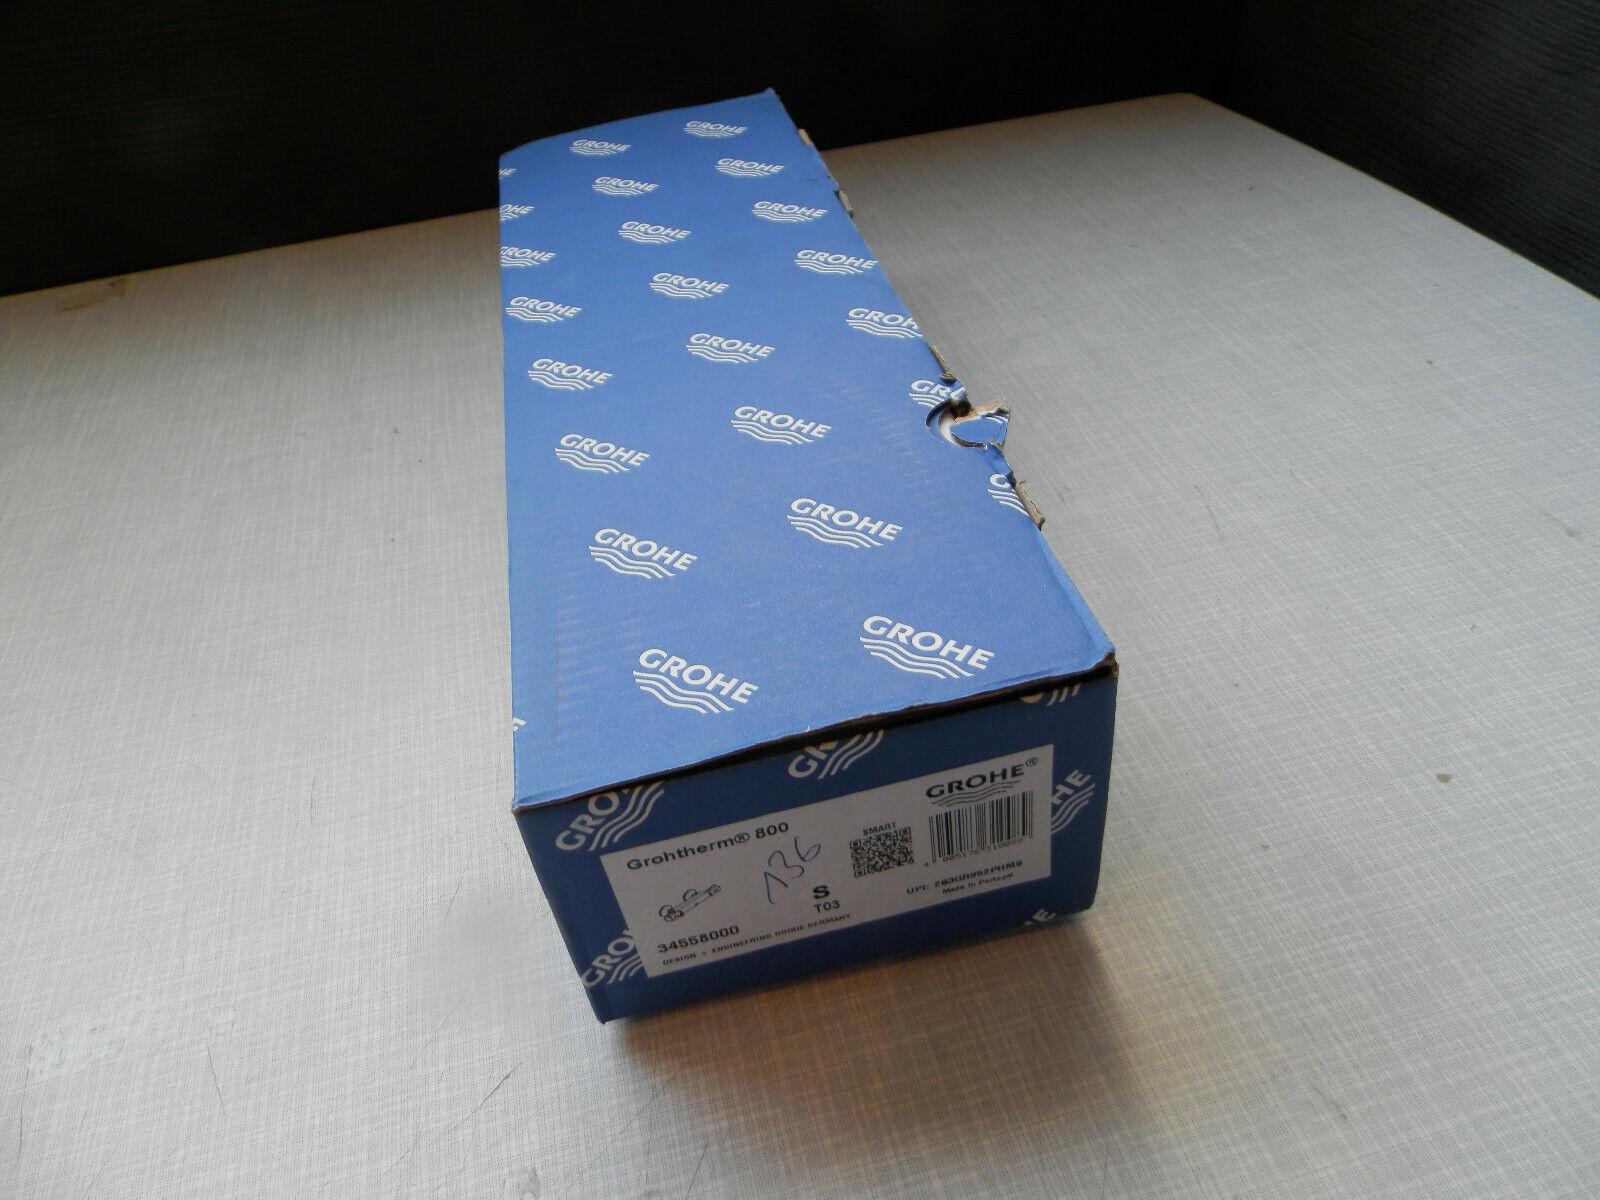 Grohe Duscharmatur Thermostat Mischbatterie Grohtherm 800 # 34558000